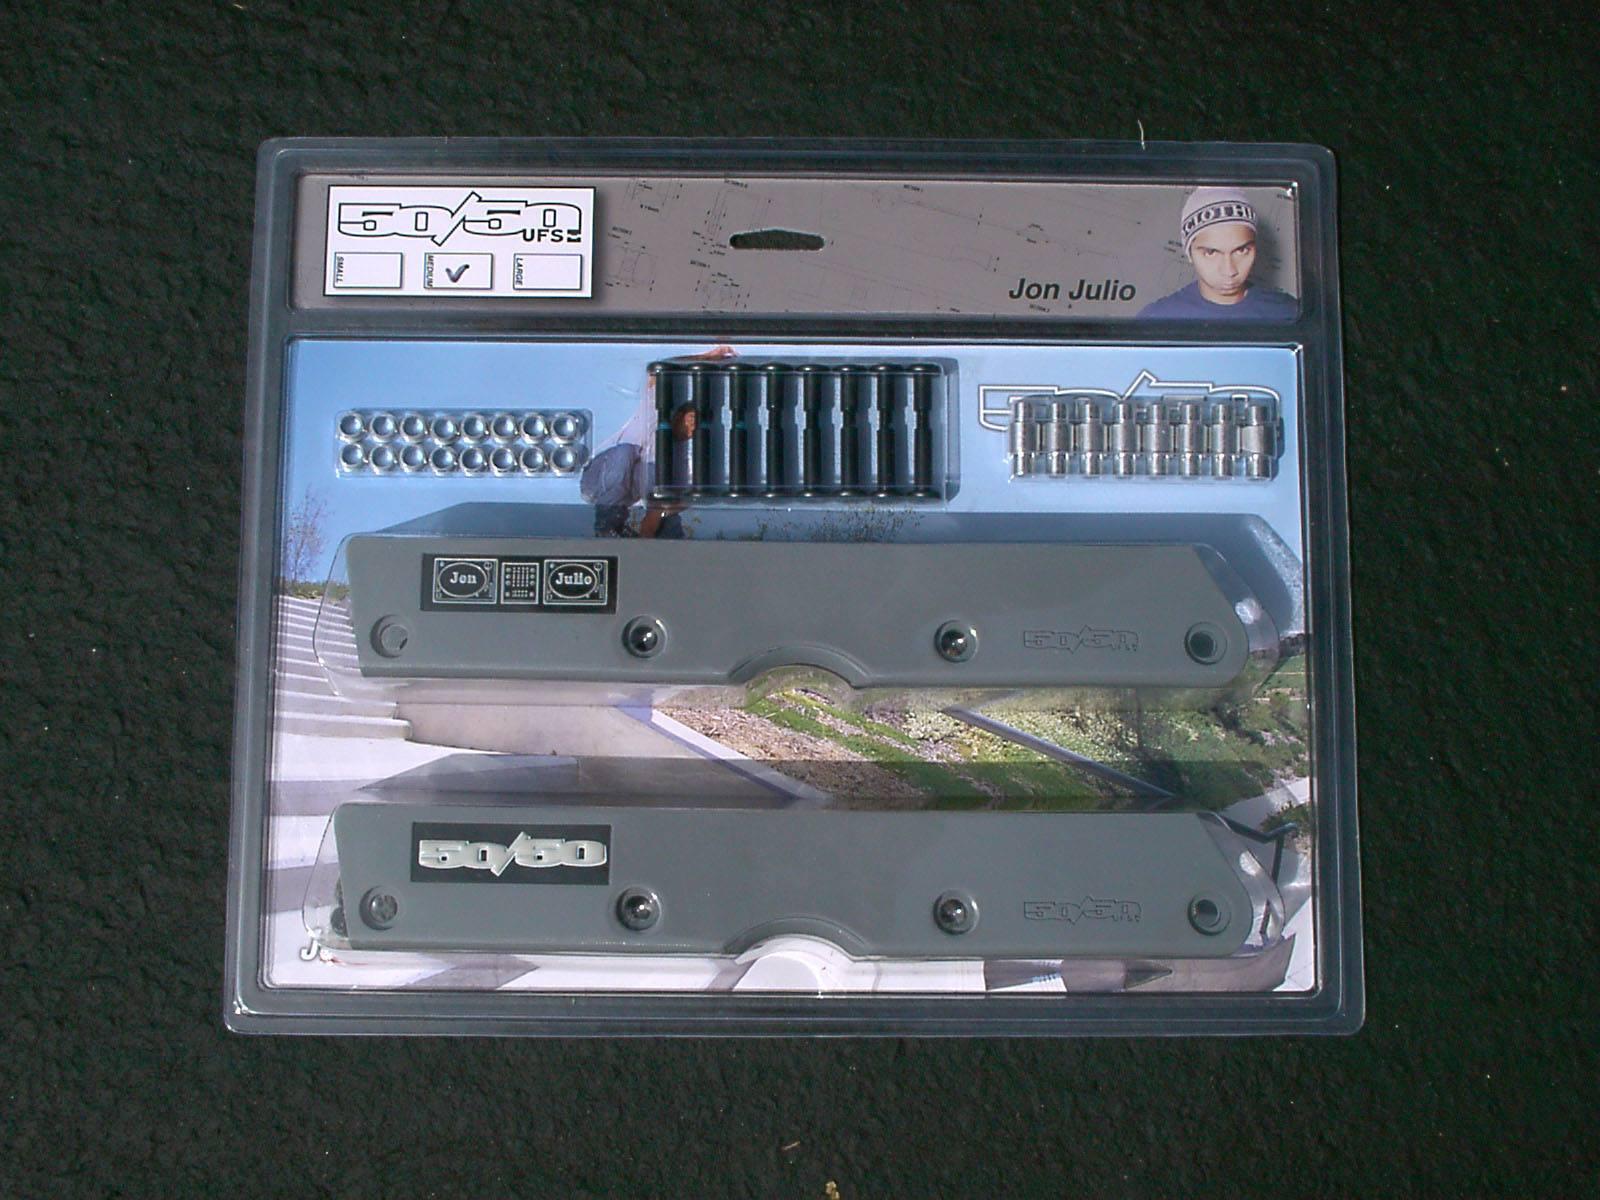 Jon Julio's series 2 50/50 UFS frame in packaging.